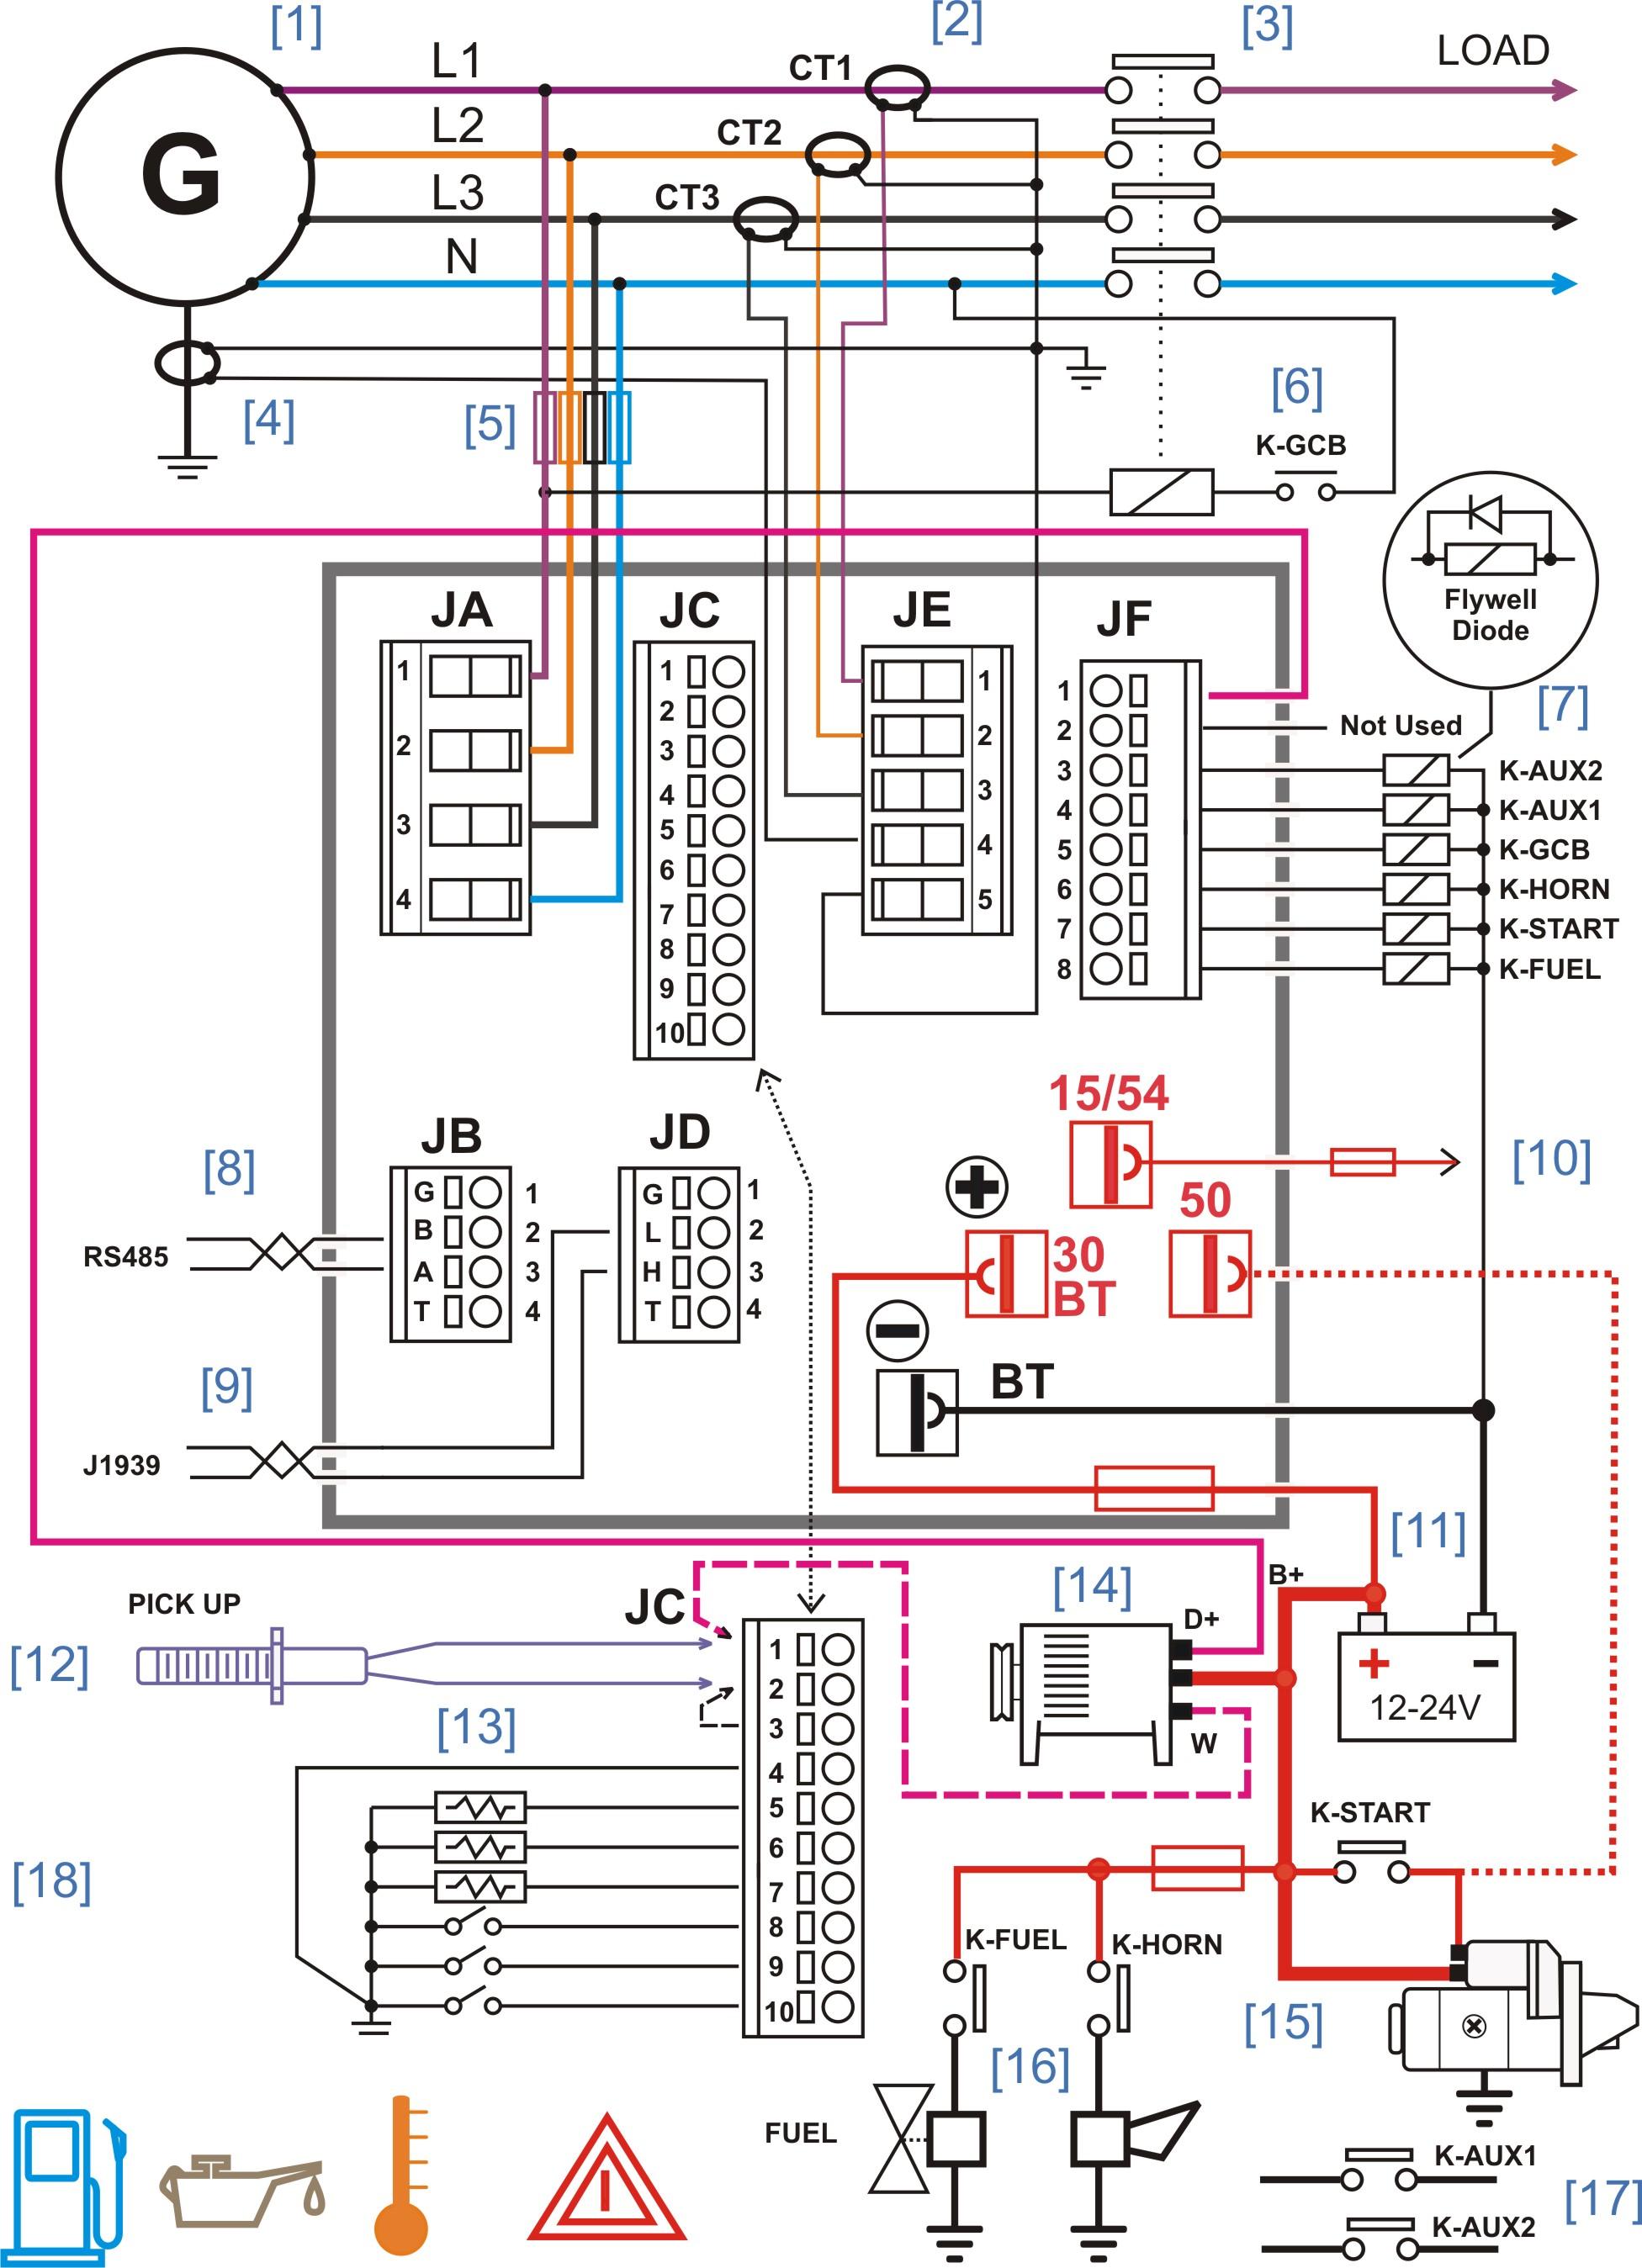 Diesel Generator Control Panel Wiring Diagram?resize\\\\\\\\\\\\\\\=665%2C919\\\\\\\\\\\\\\\&ssl\\\\\\\\\\\\\\\=1 xerox jcf 1 tray wiring diagram,jcf \u2022 edmiracle co  at creativeand.co